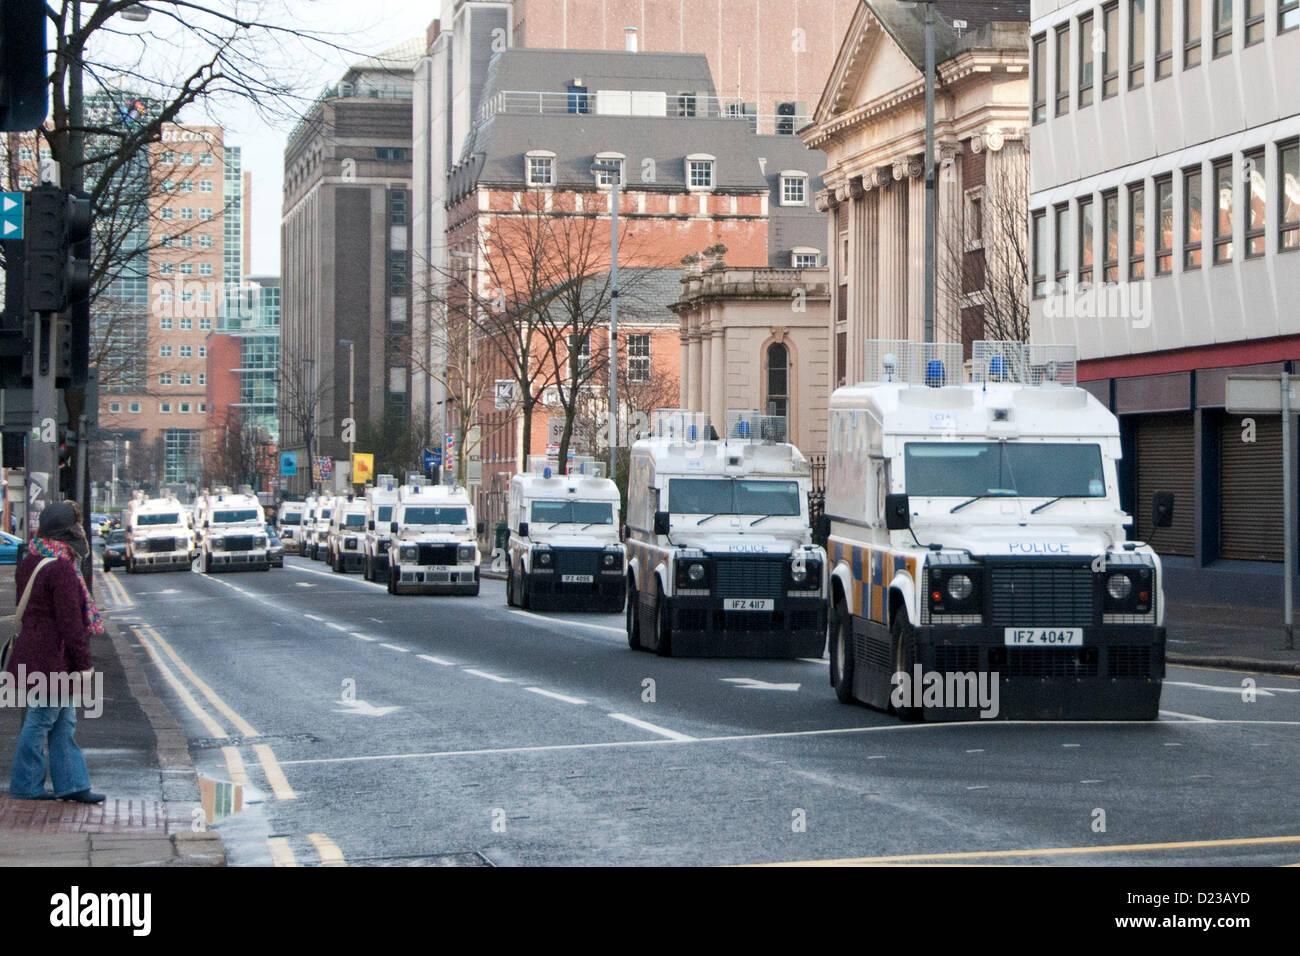 dda7d7ba2a Armoured Police Vehicles Stock Photos   Armoured Police Vehicles ...